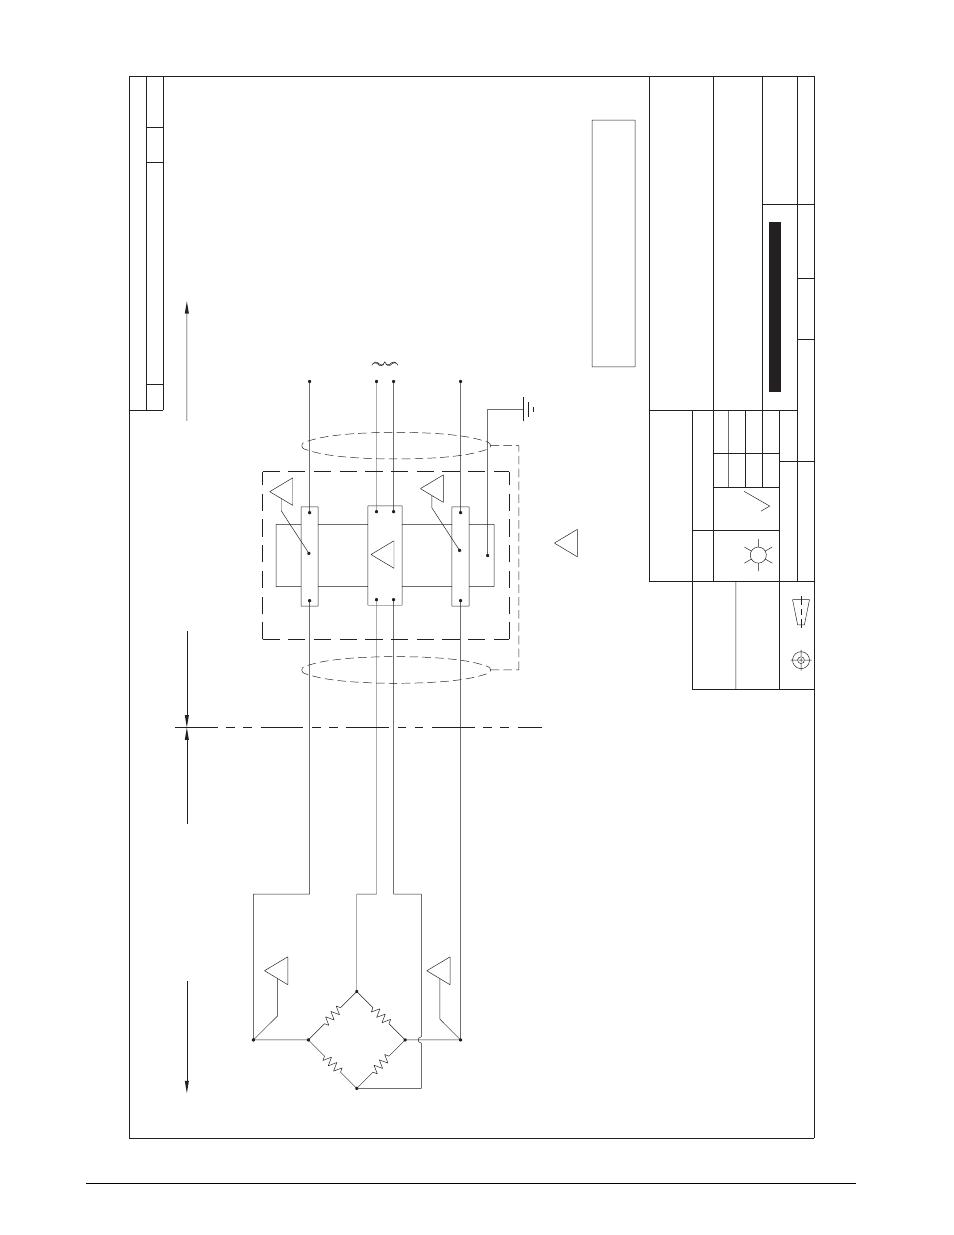 wiring diagram, load cells in hazardous areas, 8 load cell wiring for  hazardous environments